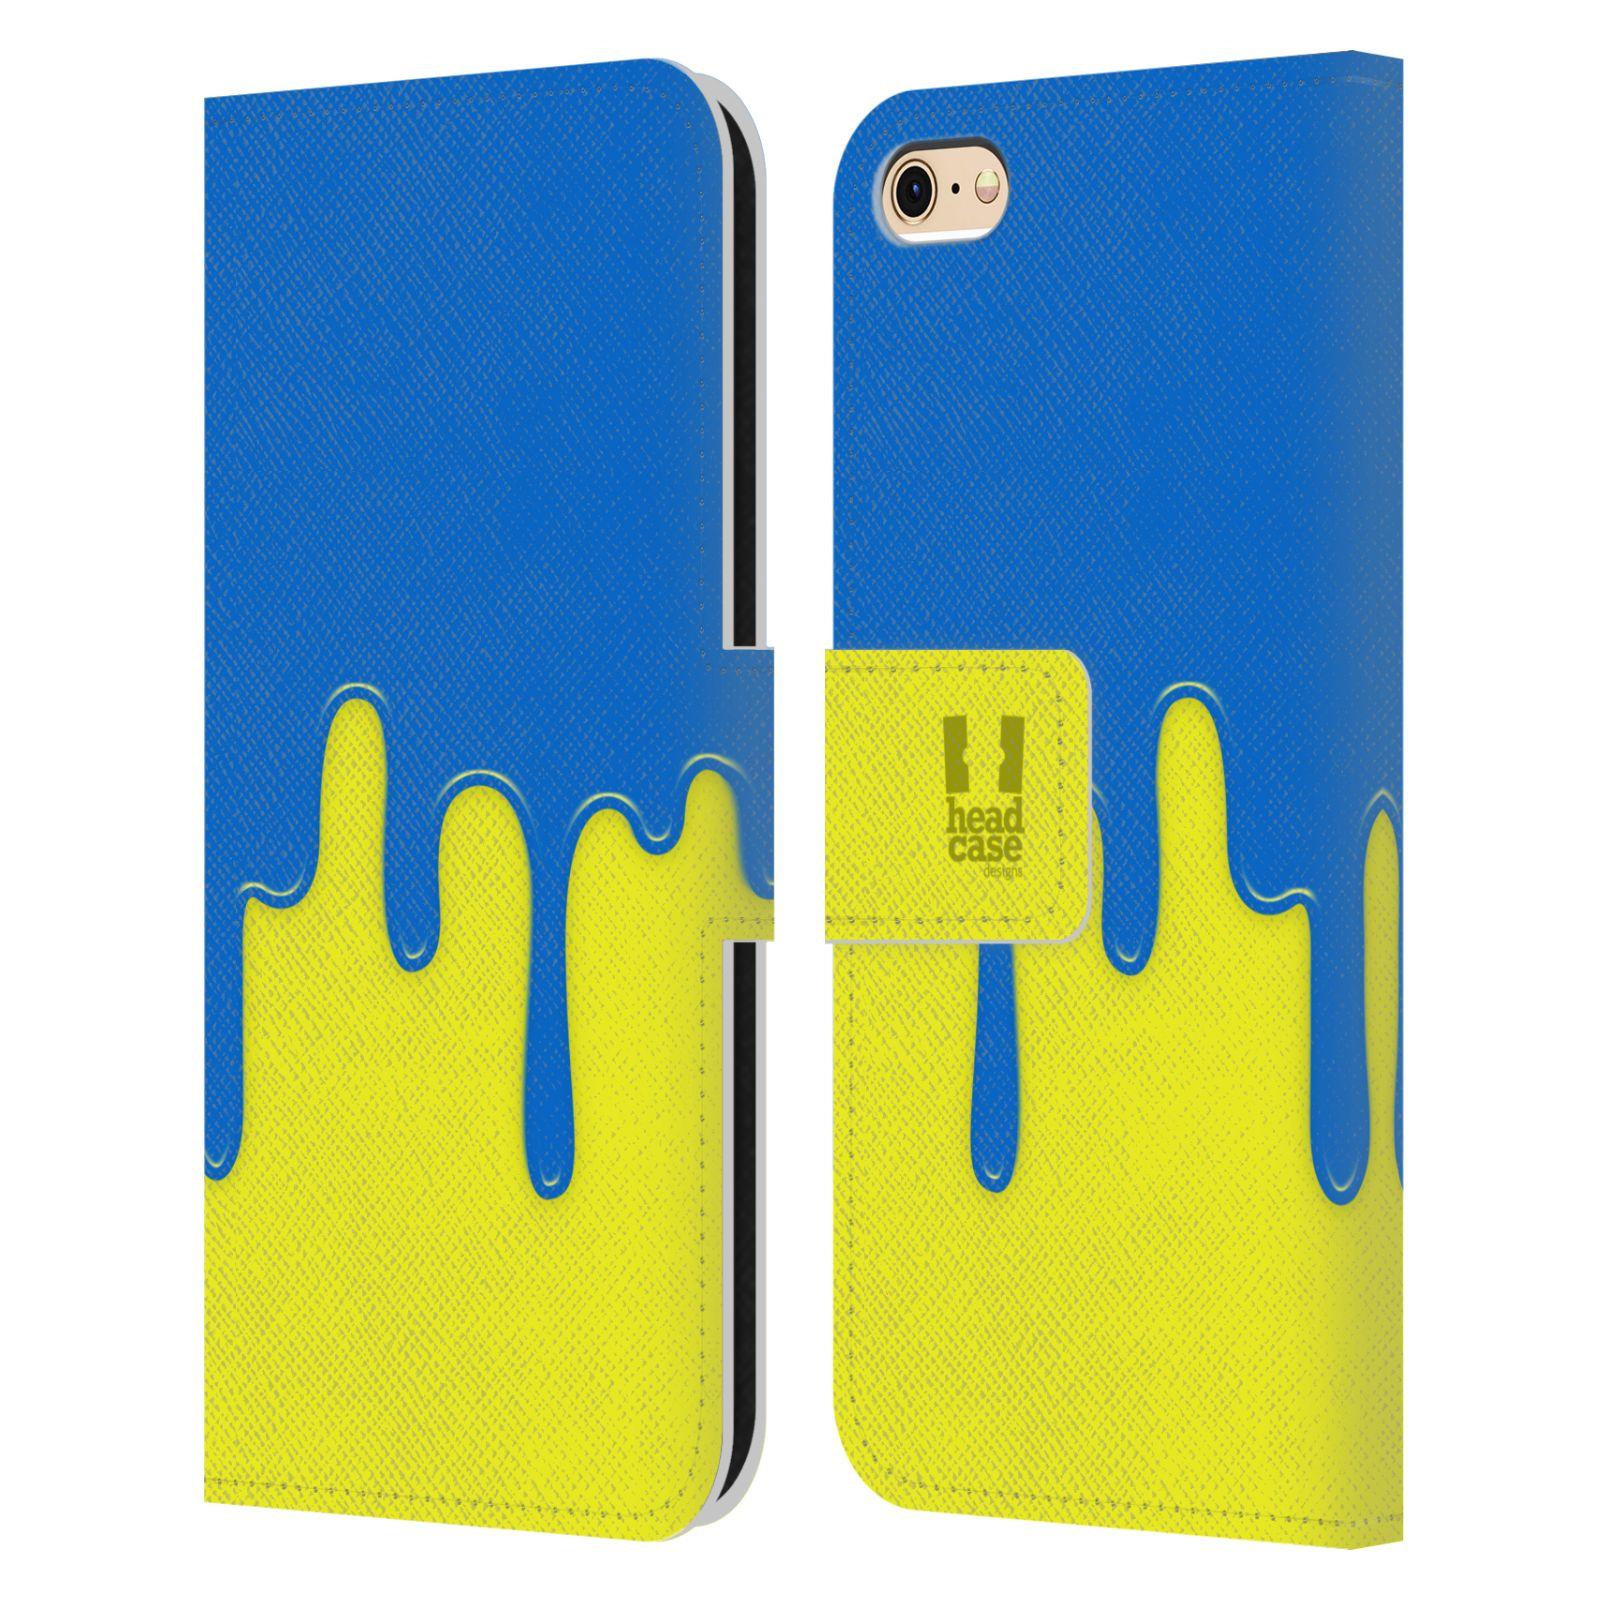 HEAD CASE Flipové pouzdro pro mobil Apple Iphone 6/6s Rozlitá barva modrá a žlutá